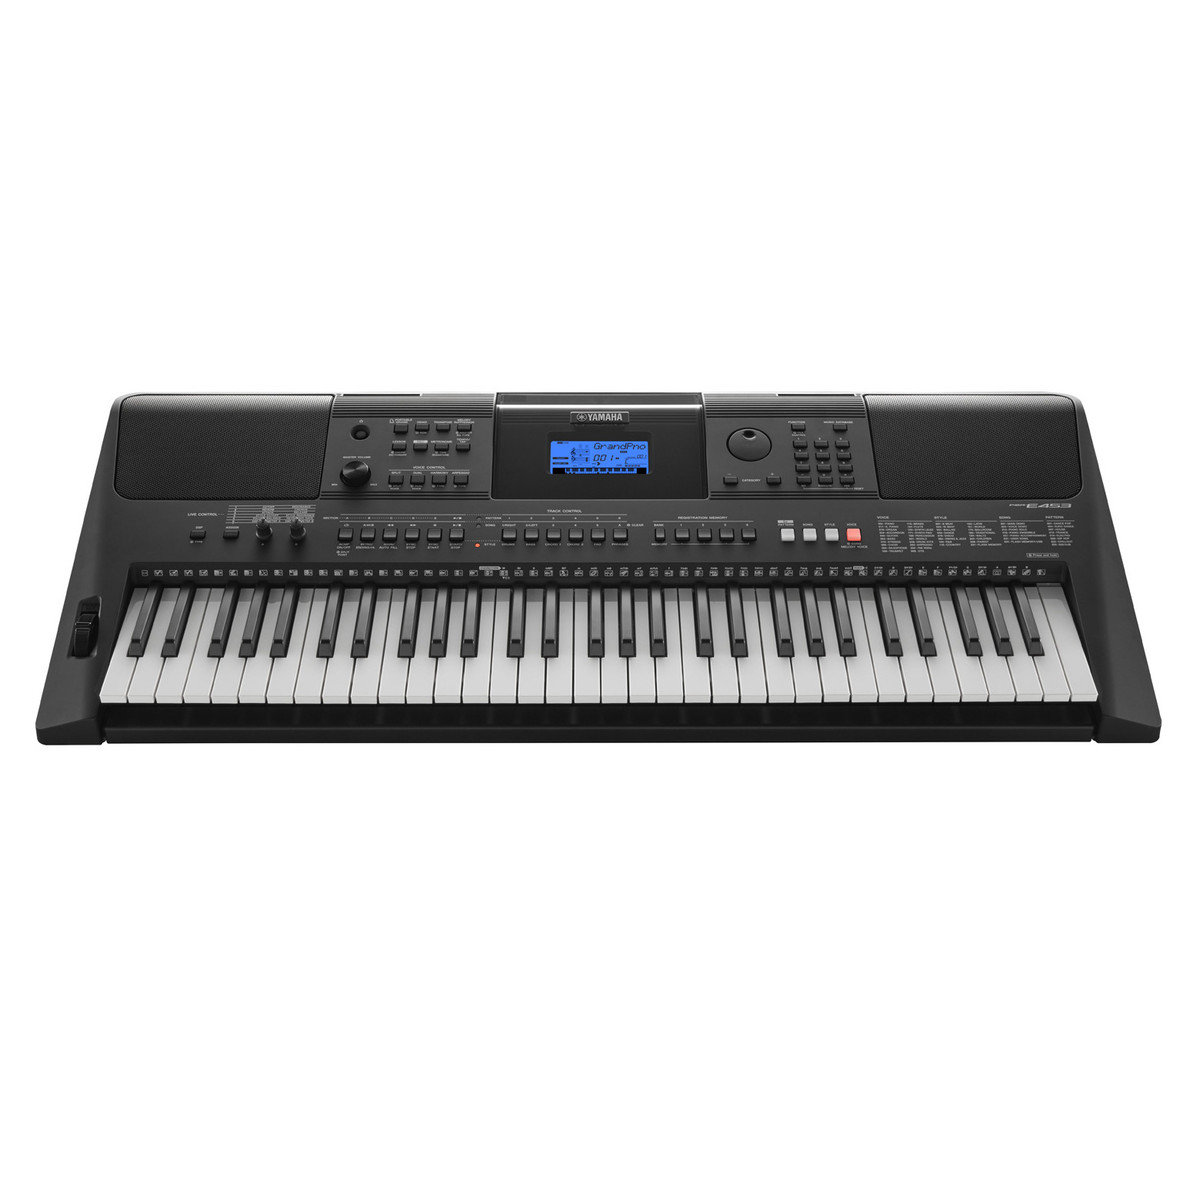 Yamaha psr e453 keyboard x frame package at for Cheap yamaha keyboards